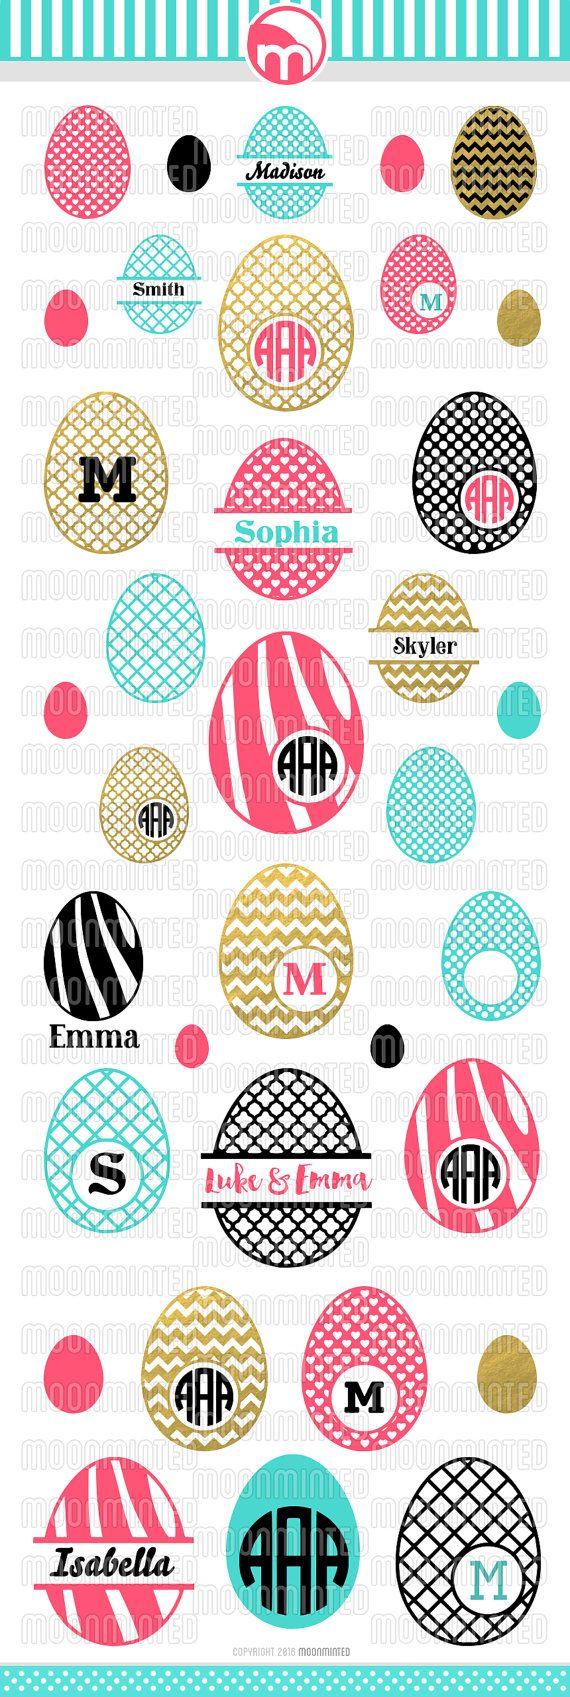 Easter Egg SVG Cut Files Monogram Frames for Vinyl by MoonMinted